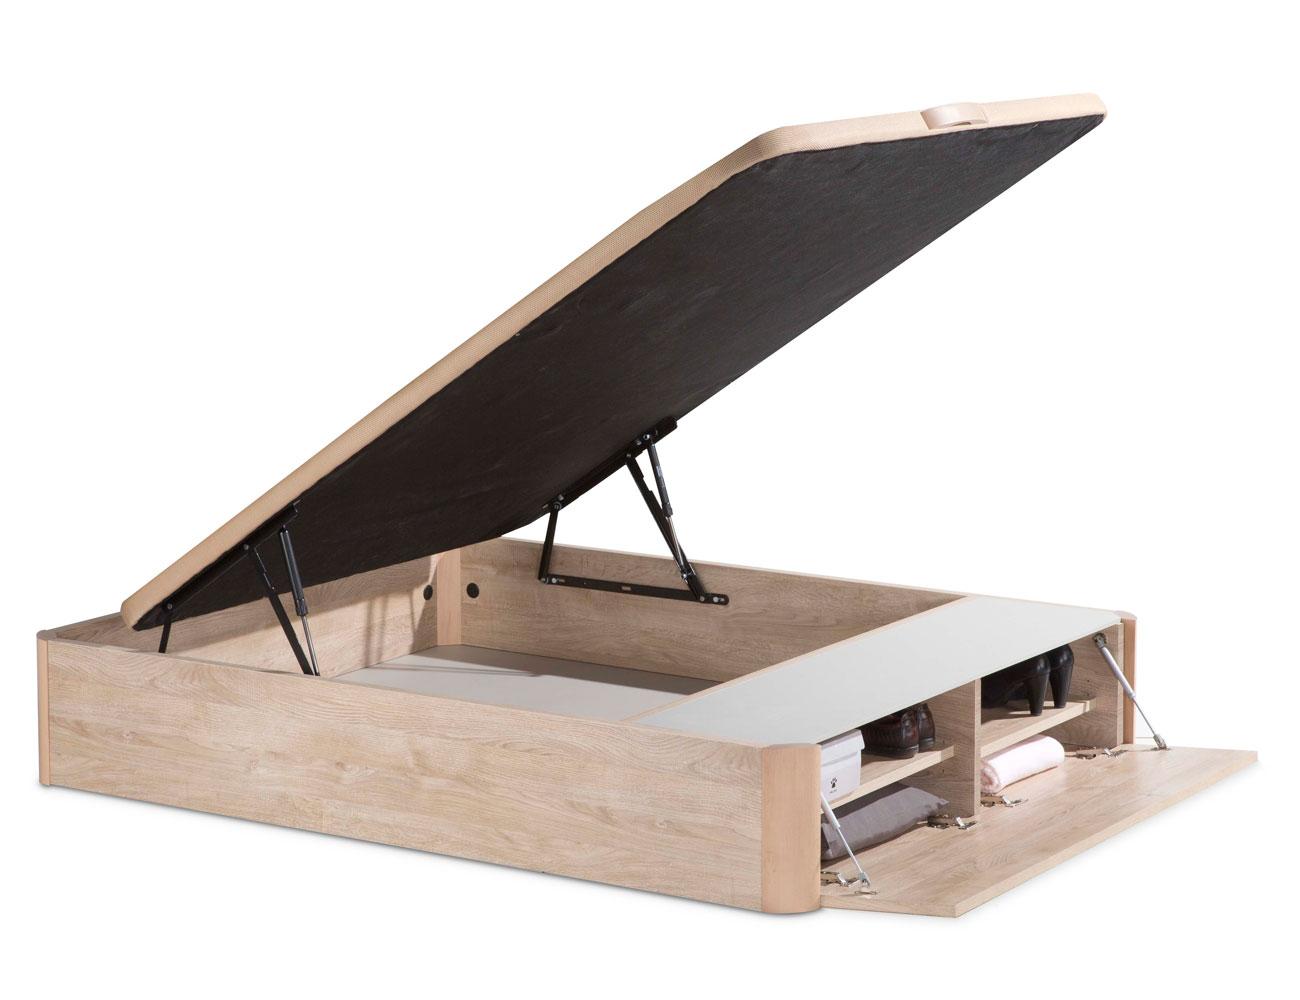 Canape zapatero madera tapa 3d 7613